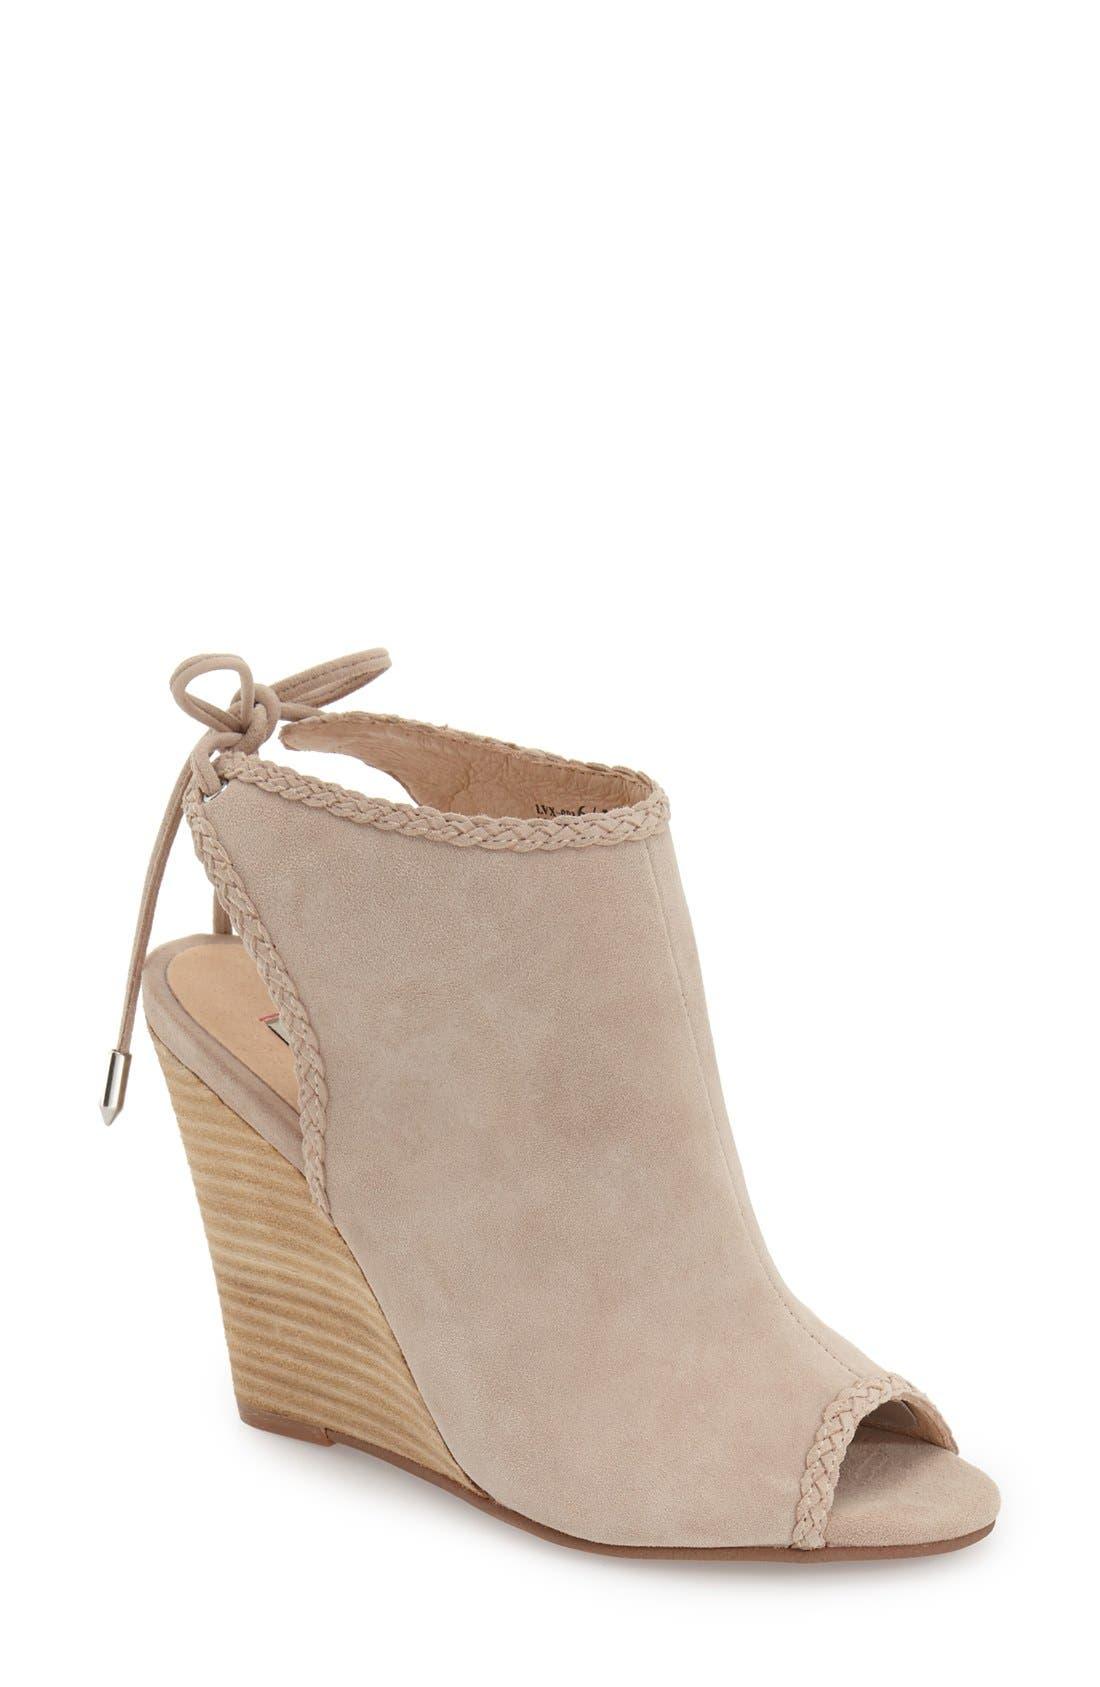 Kristin Cavallari 'Larox' Wedge Sandal (Women)